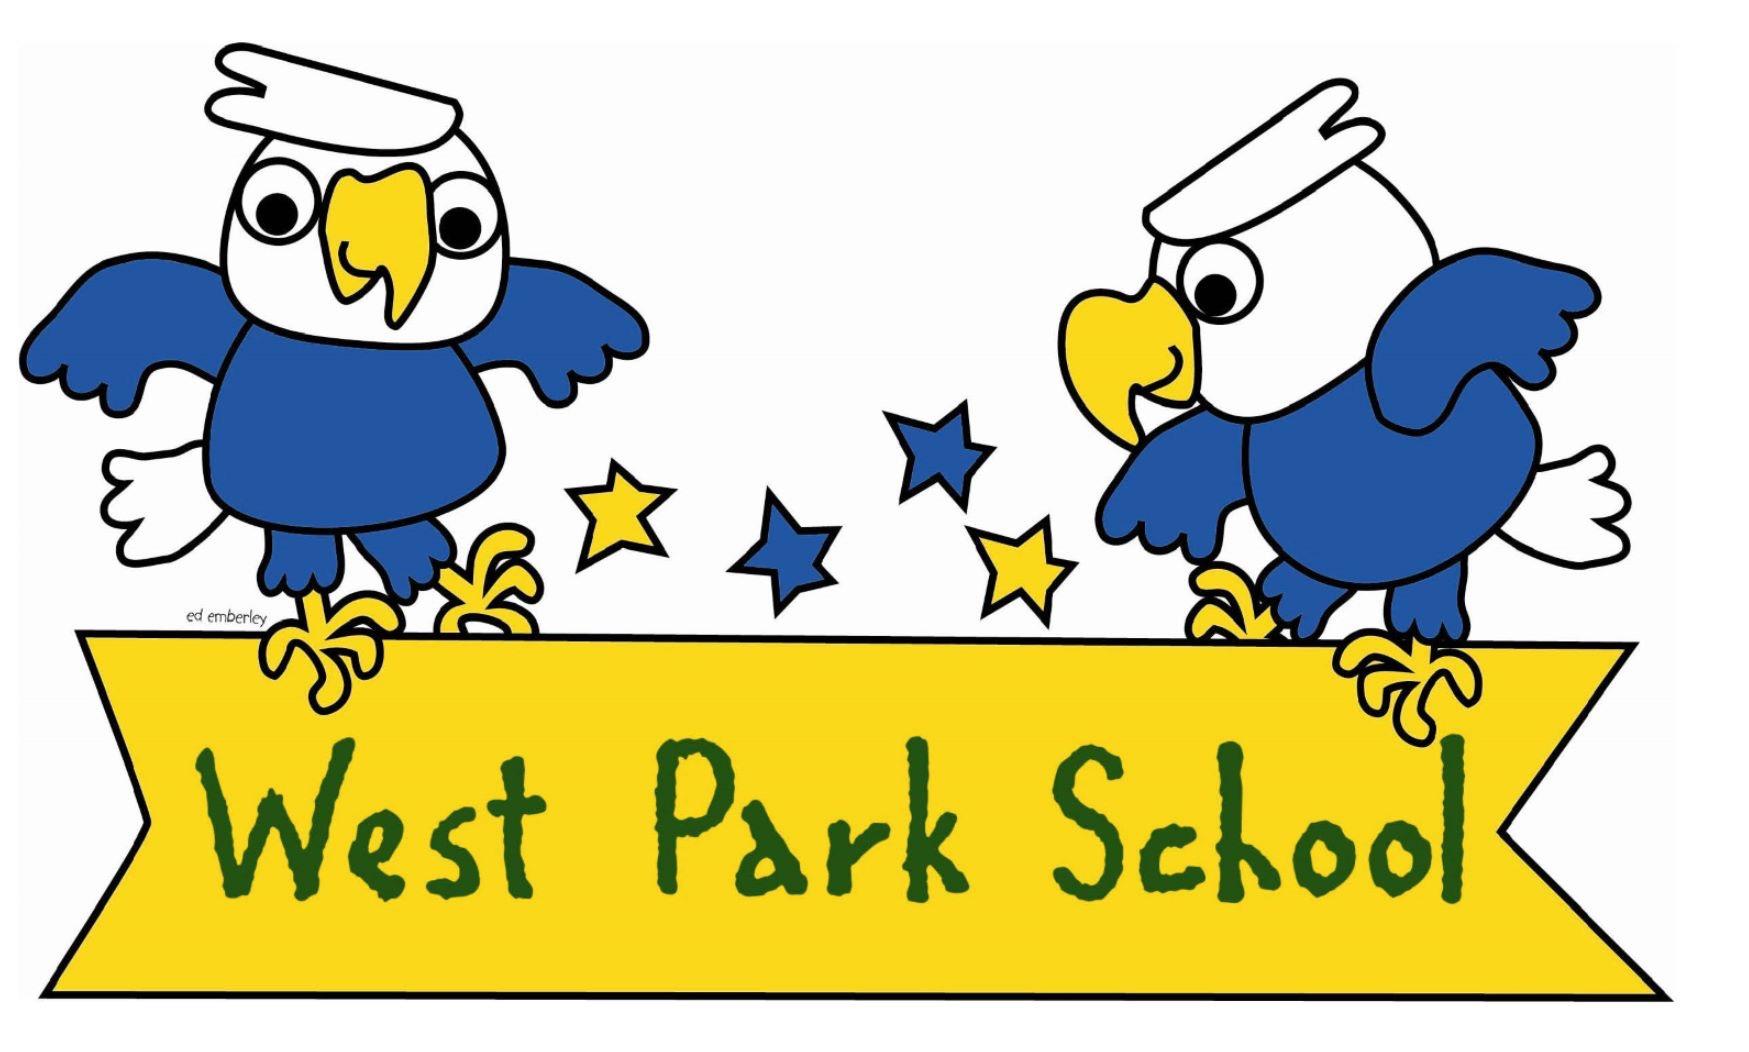 West Park Elementary School